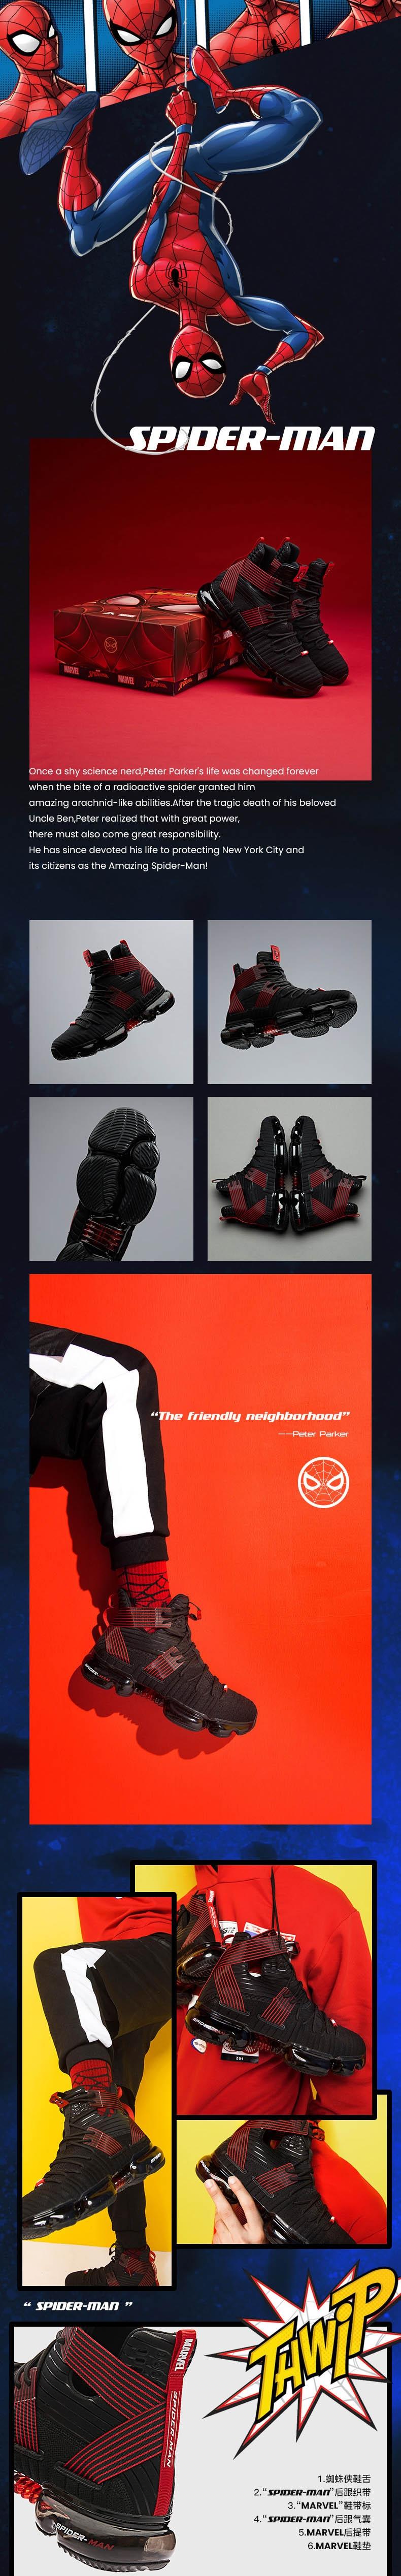 "Anta X Seeed Series Marvel Memorial Edition - ""SPIDER MAN"" Basketball Fashion Sneakers - Black"